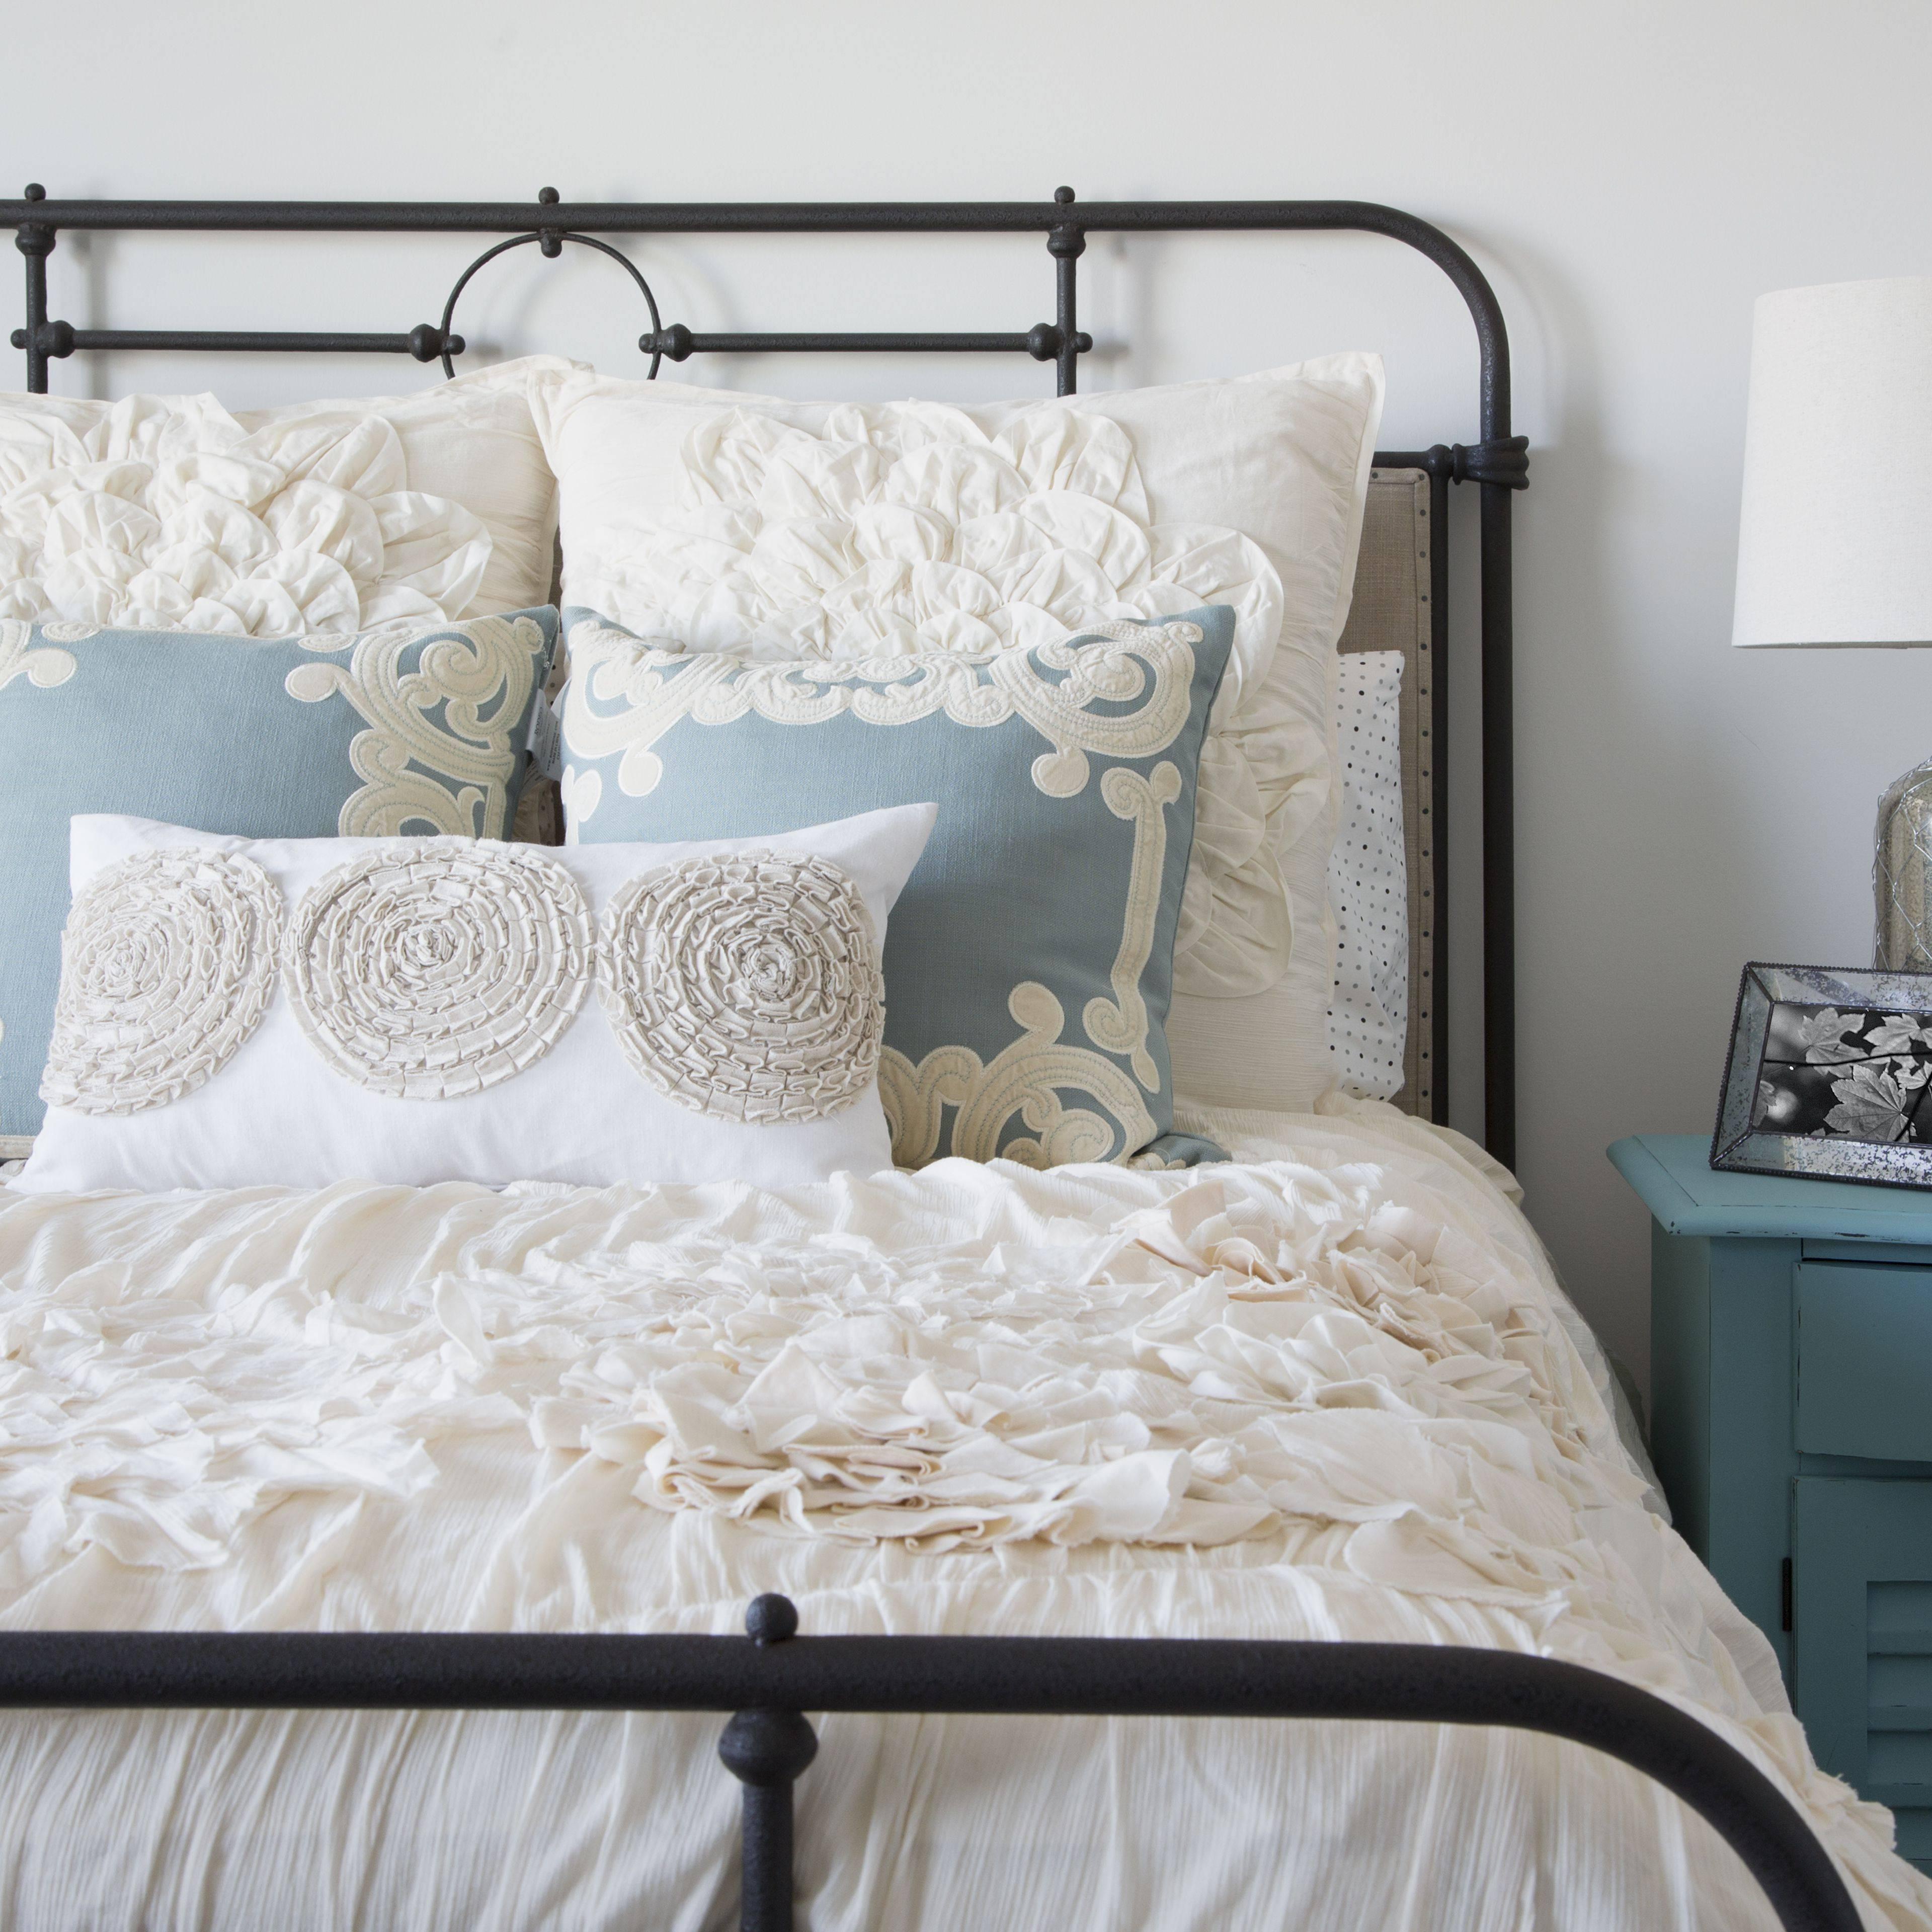 elegant bedroom 592d914c3df78cbe7e1aaa55